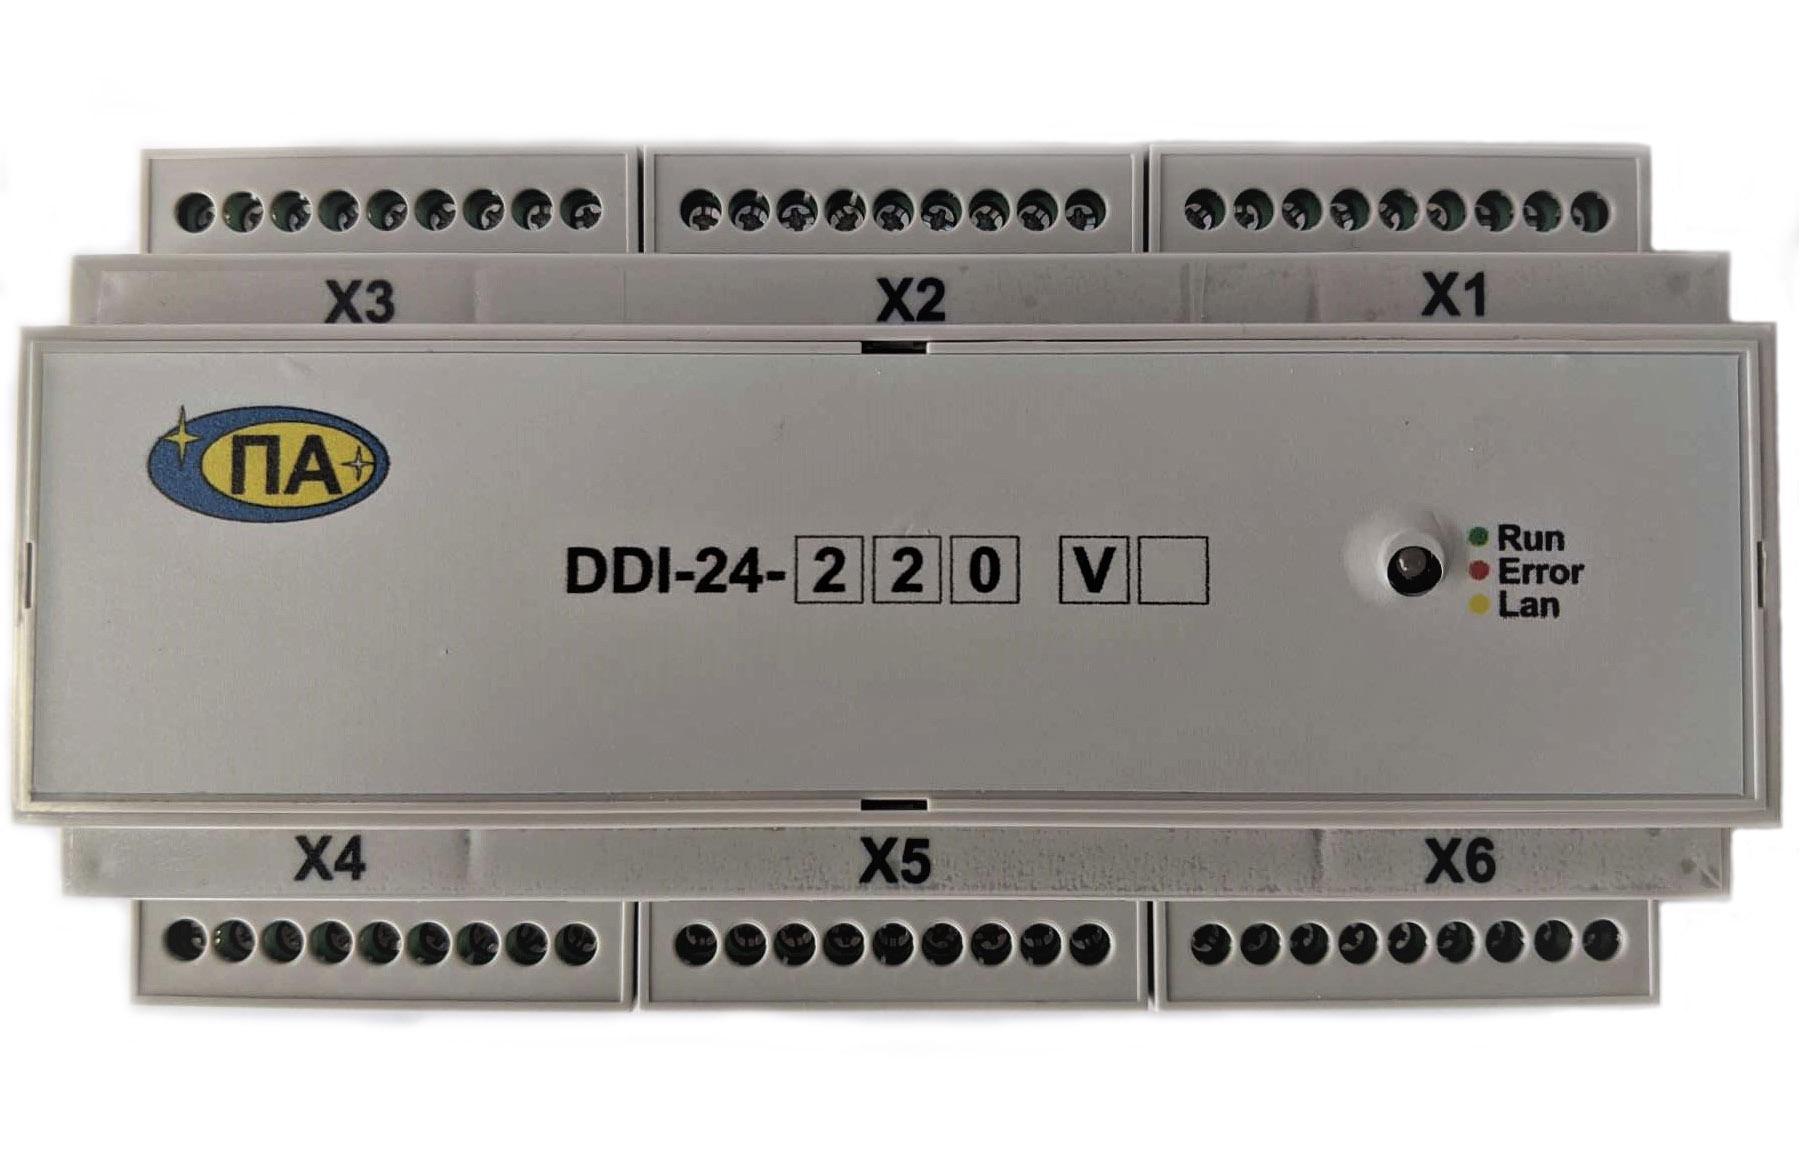 Устройство DDI-24 — 220V АИАР.426449.001